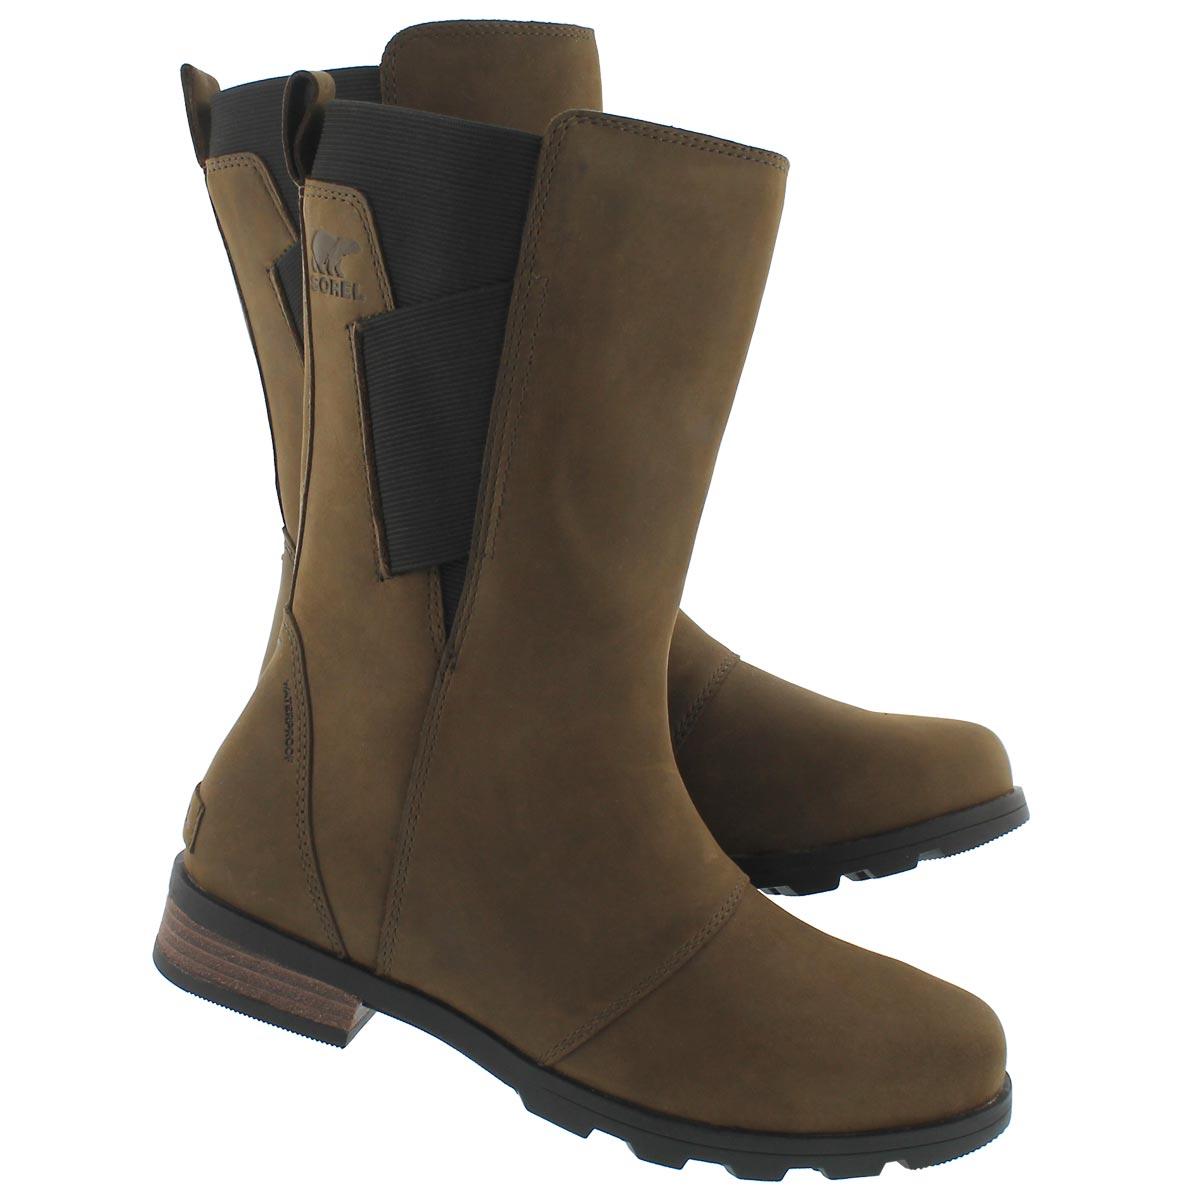 Lds Emelie Mid major/blk wtpf boot